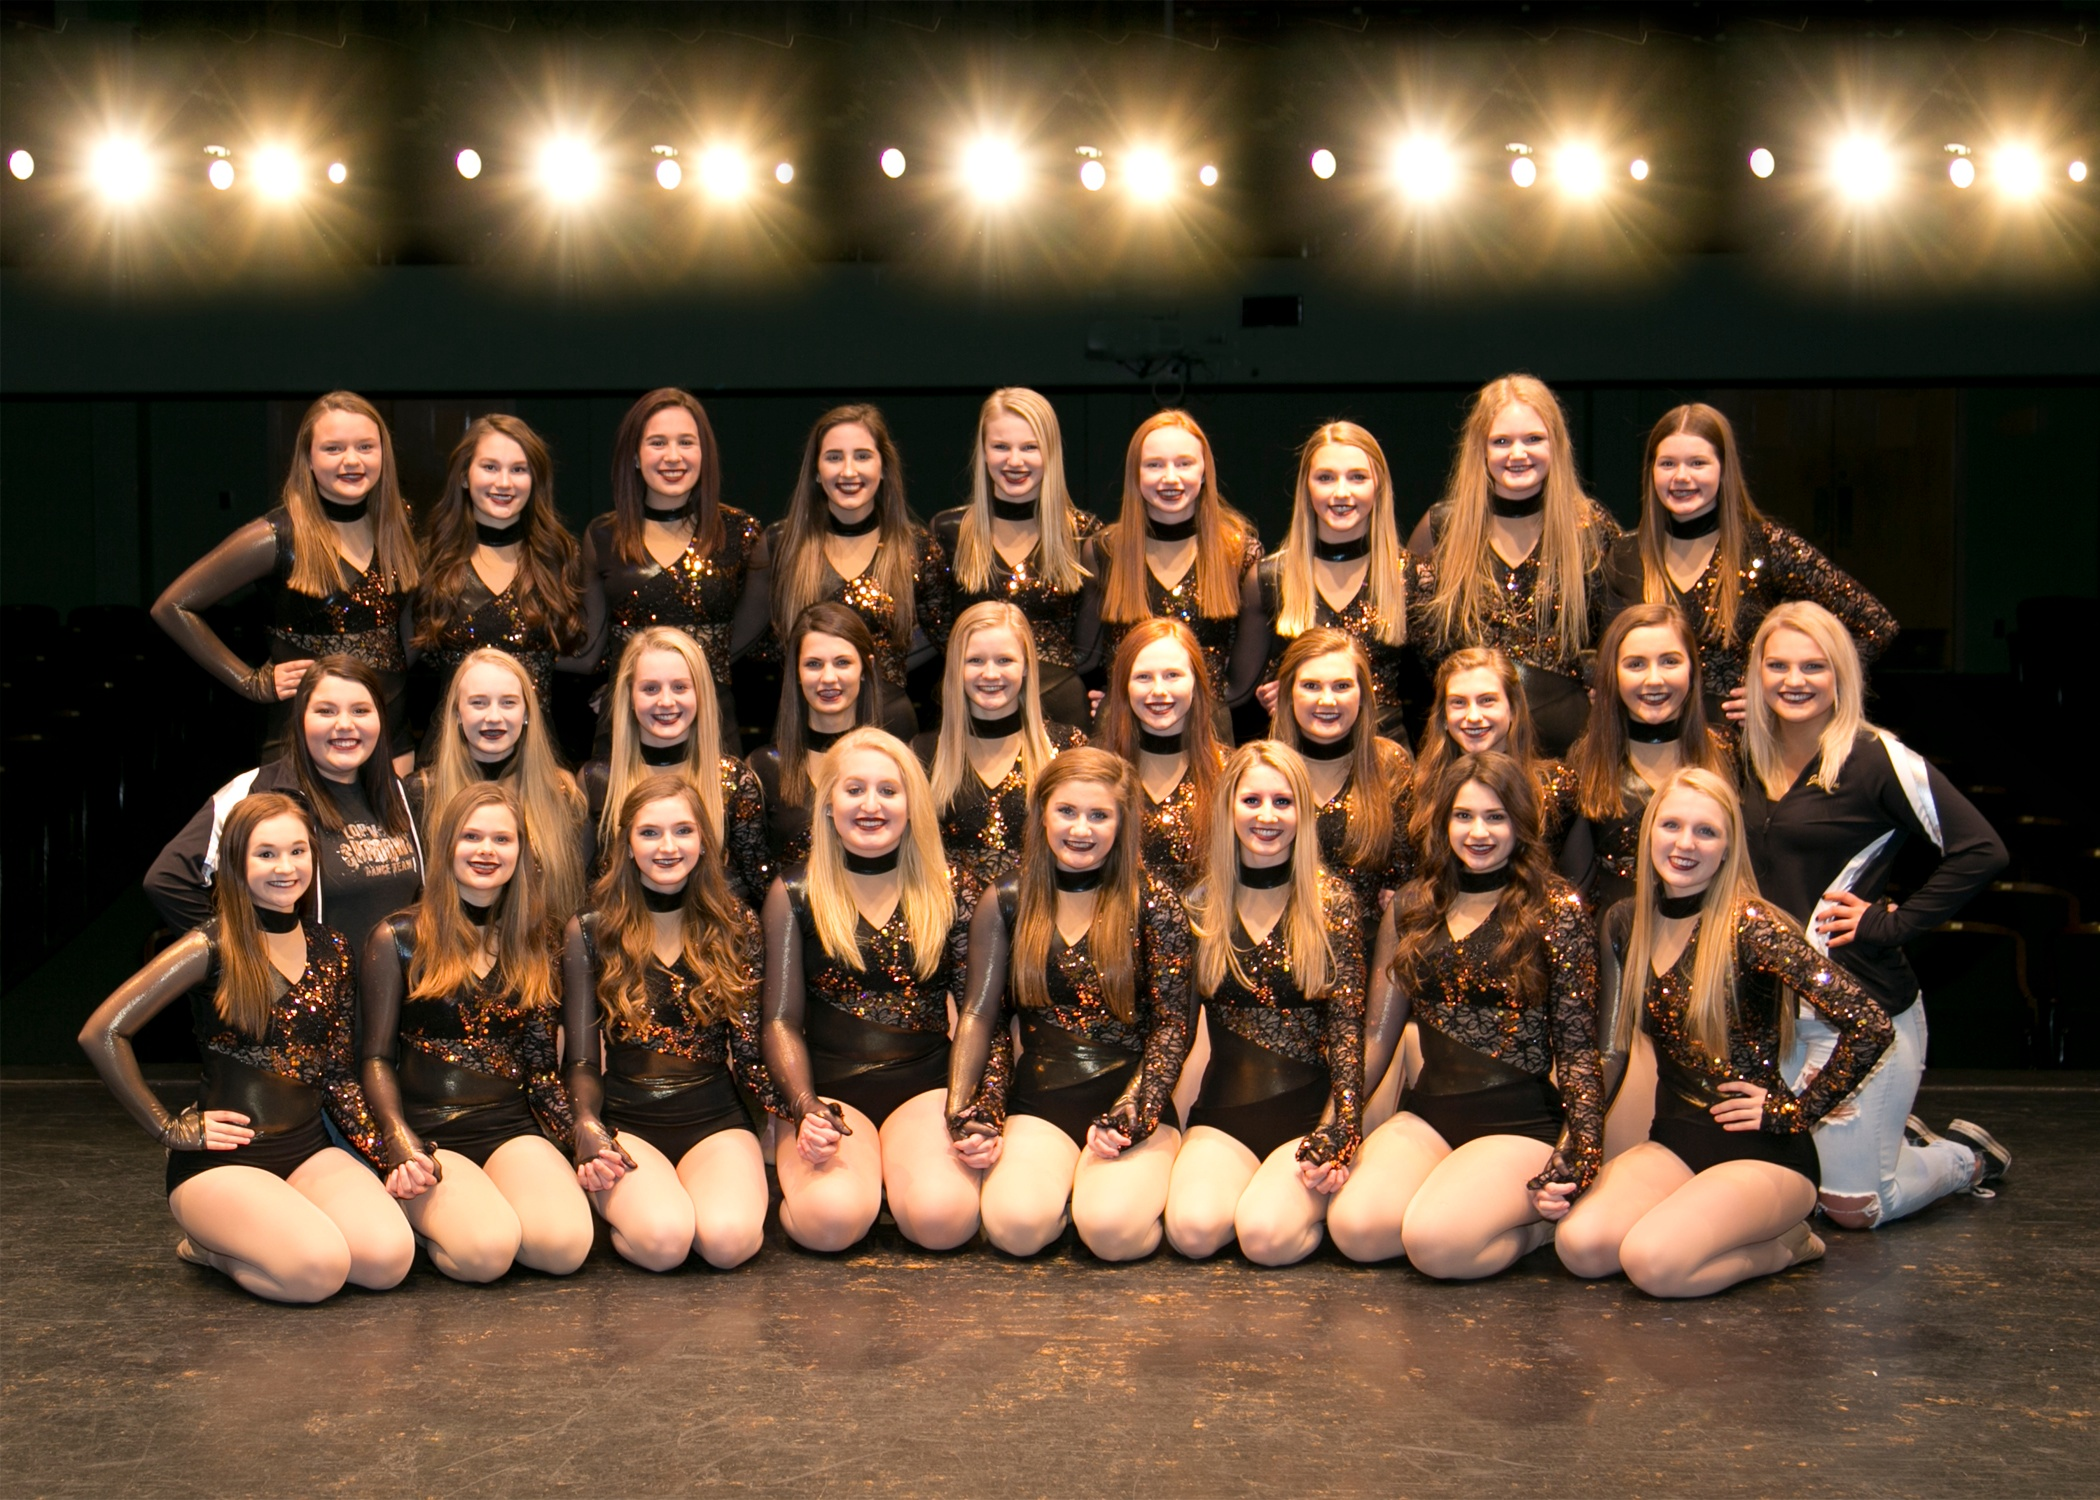 Lac Qui Parle Valley High School Dance Team High Kick costume